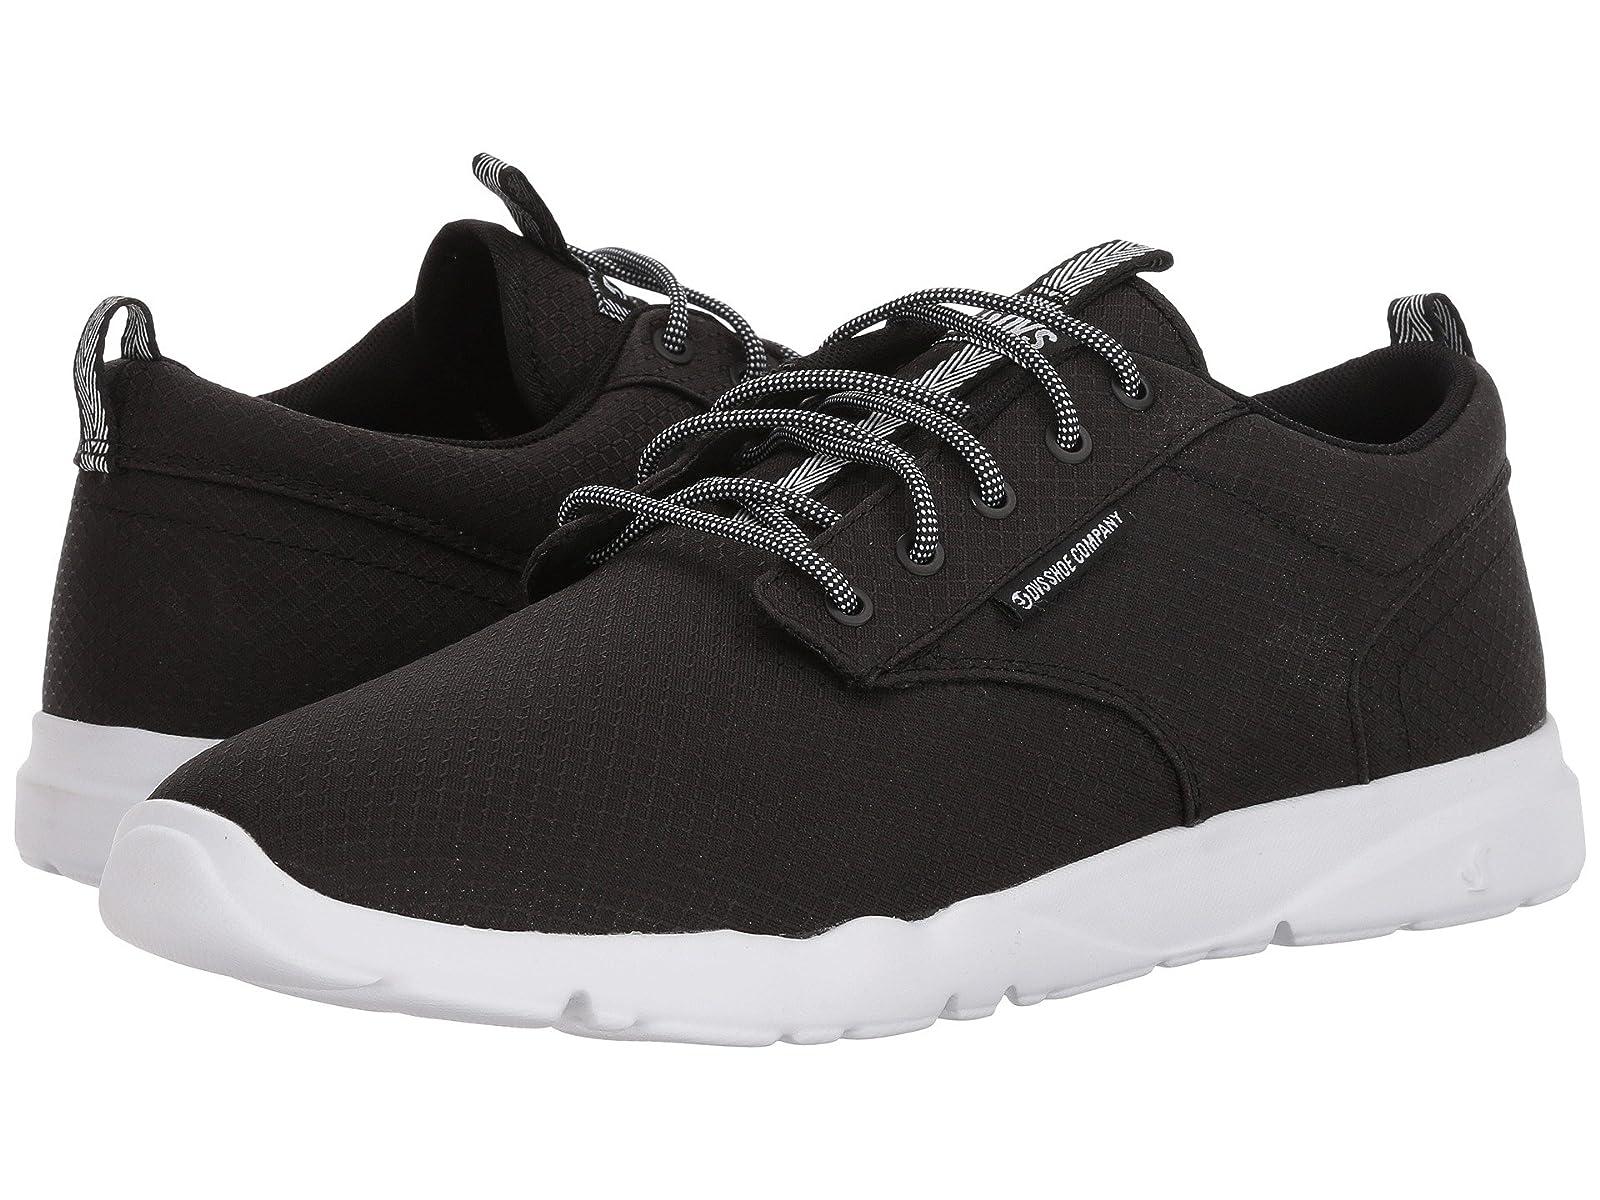 DVS Shoe Company Premier 2.0+Atmospheric grades have affordable shoes